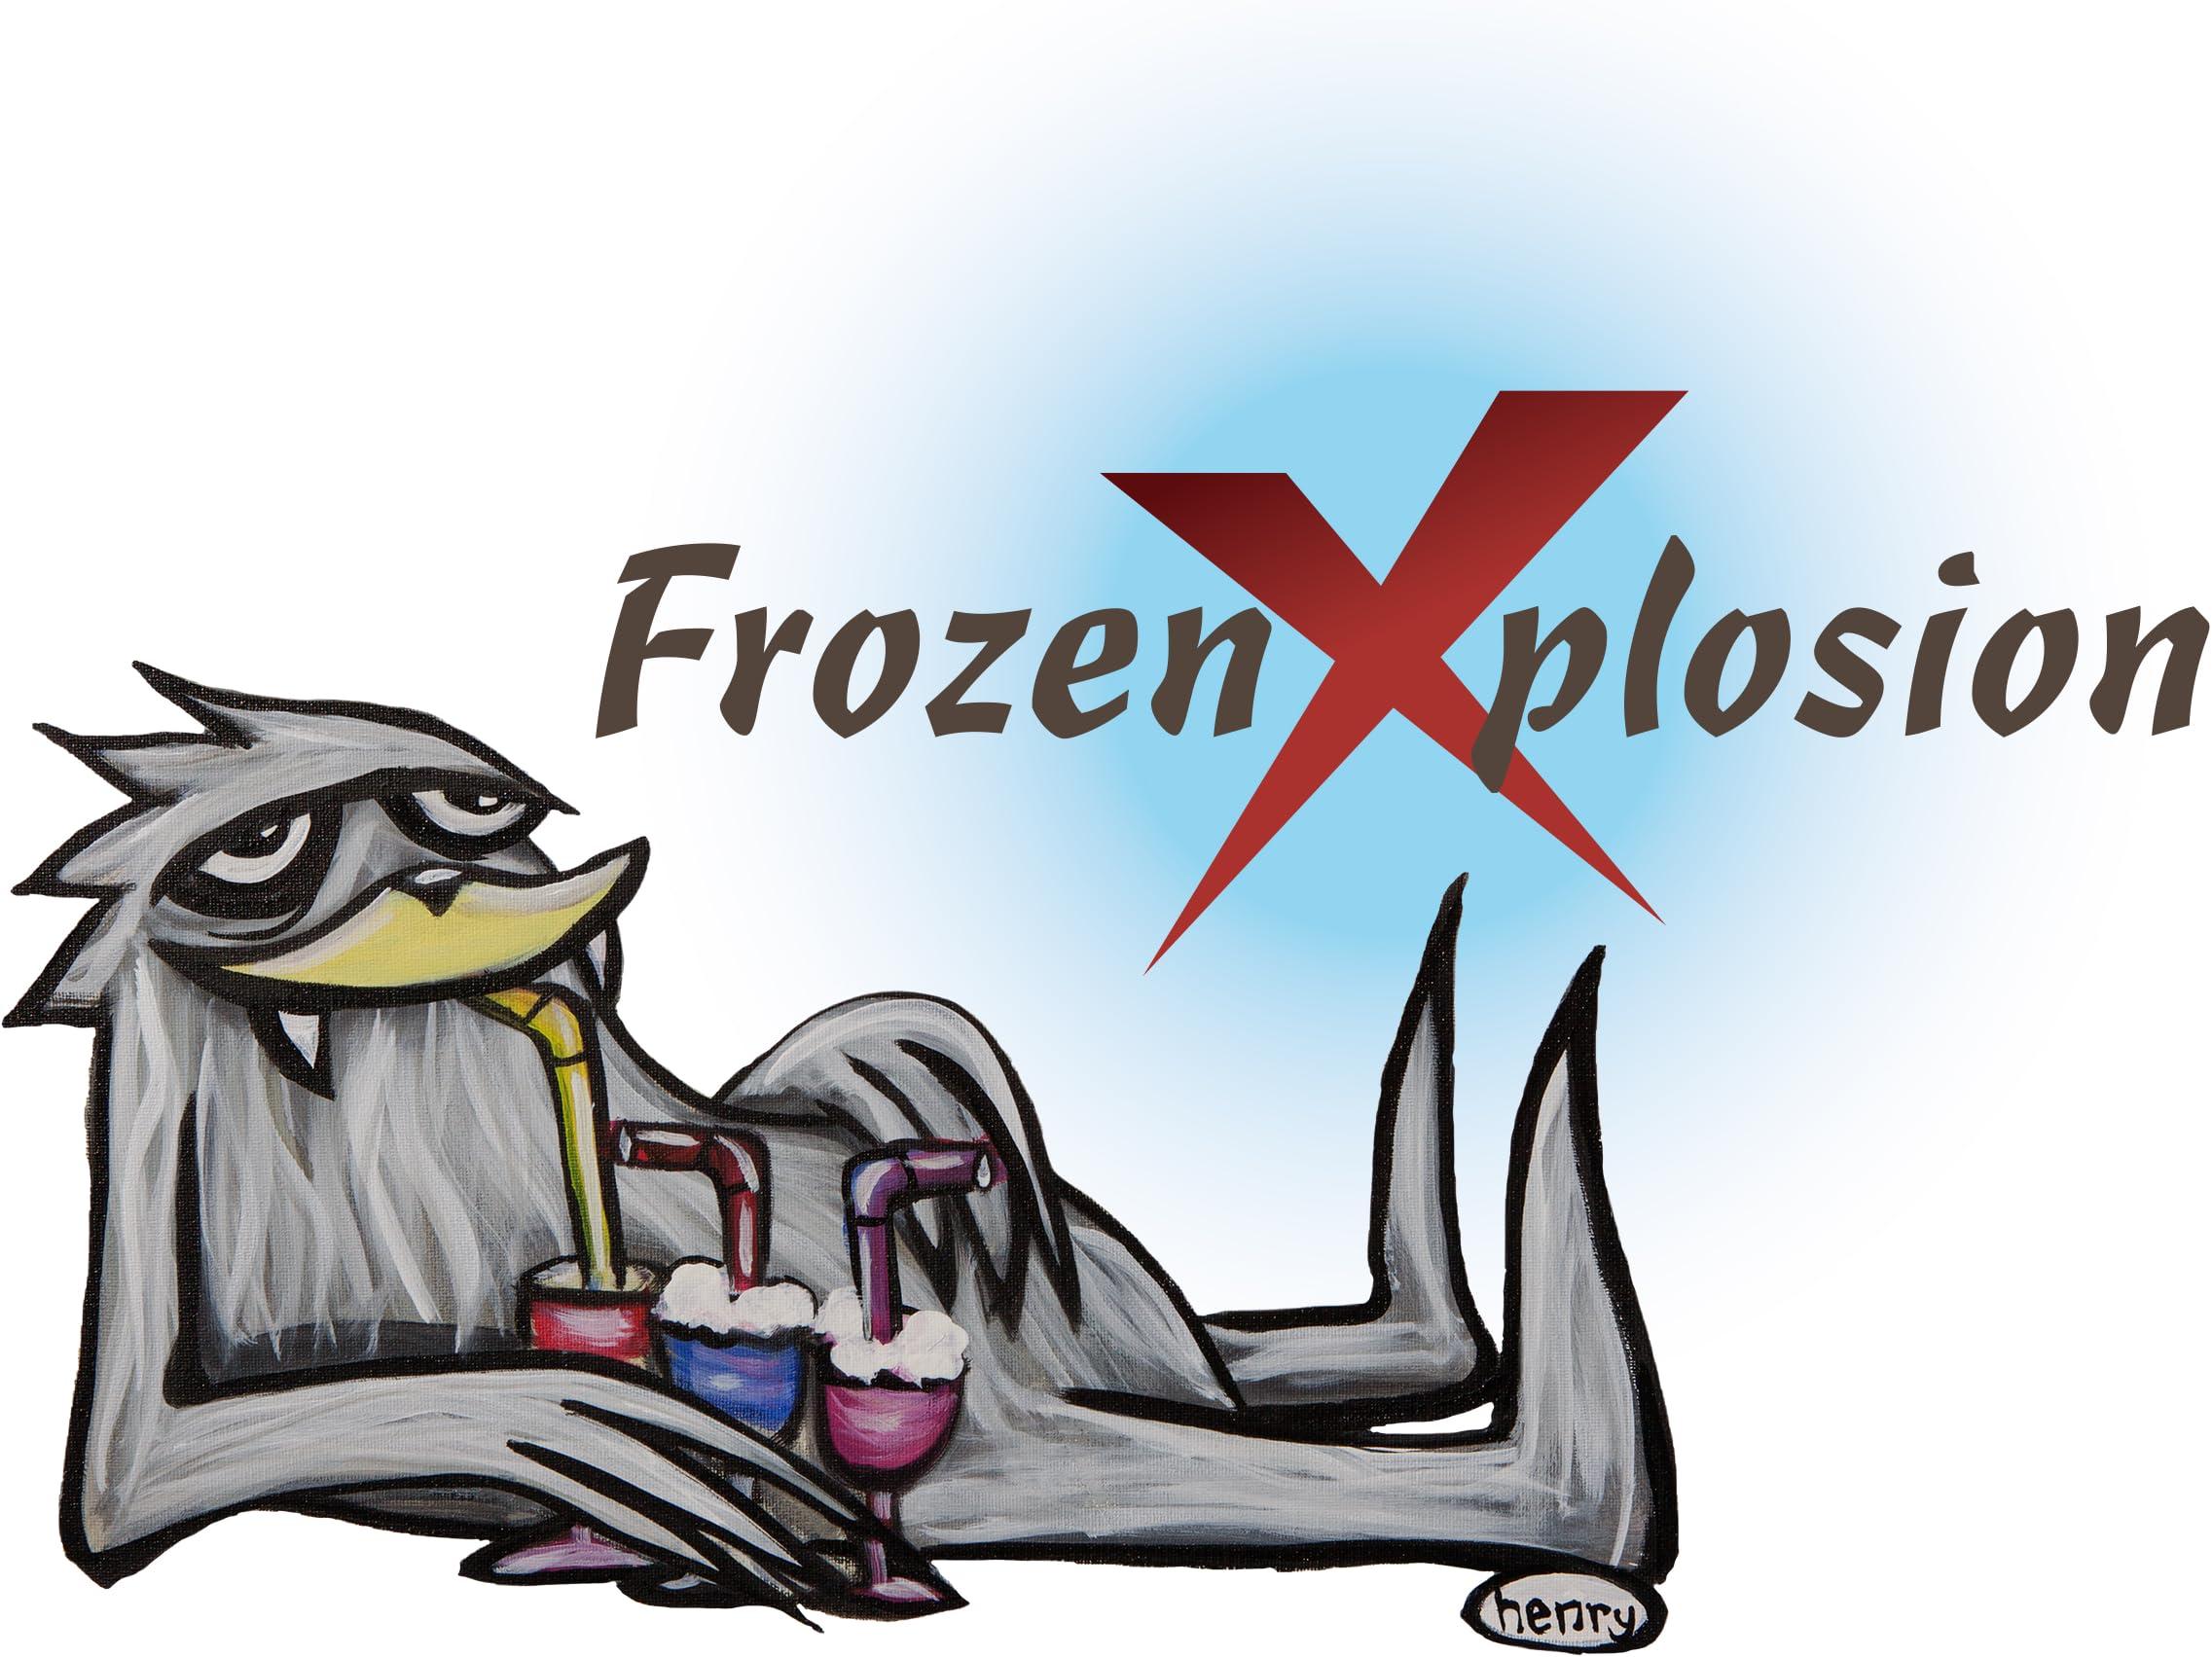 Frozen X-plosion